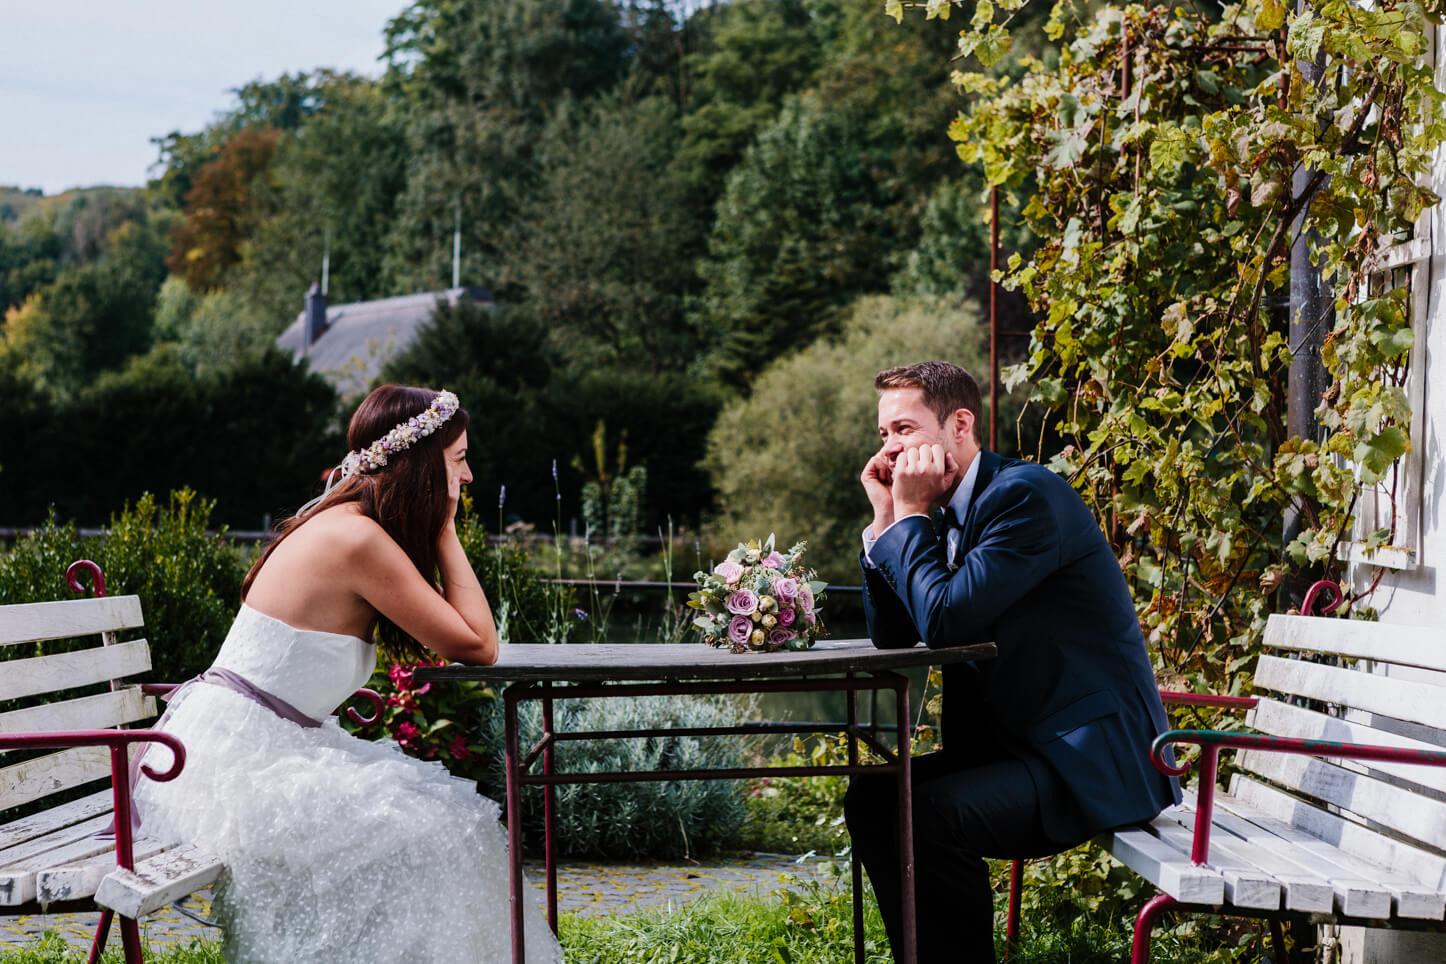 Brautpaar in Herrenstrunden